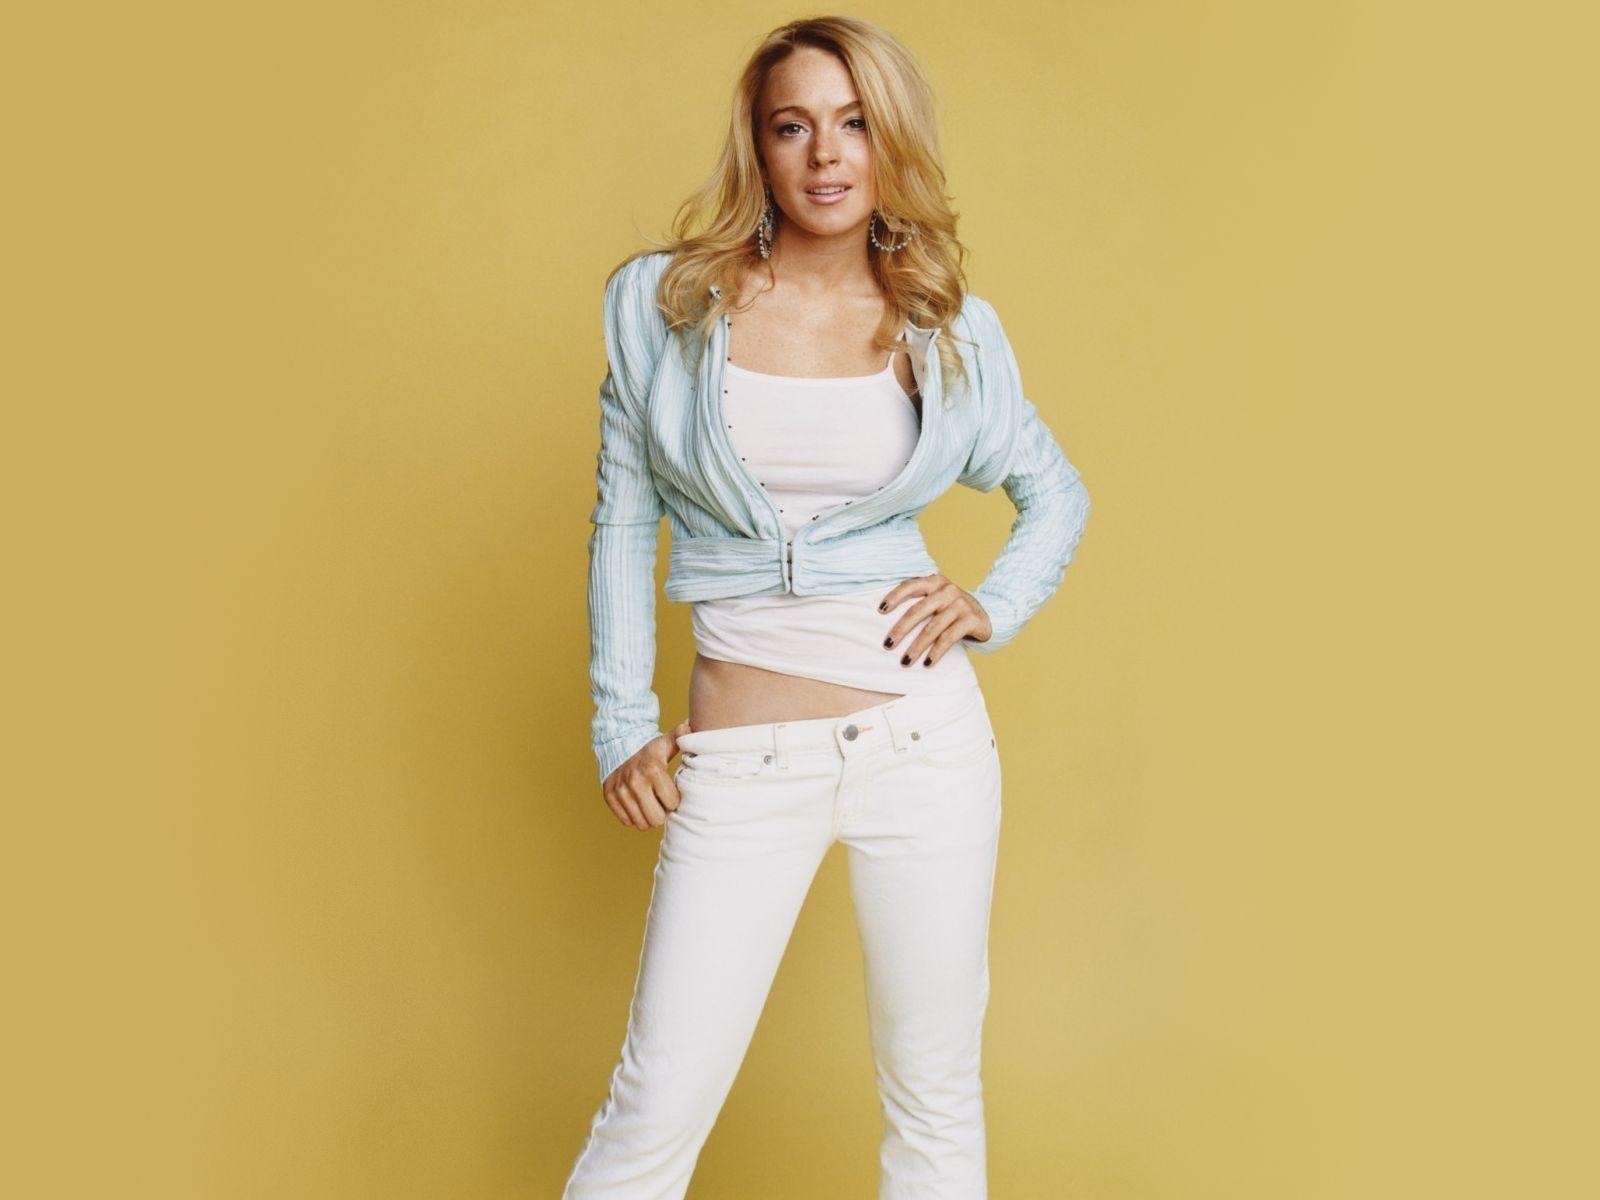 Sharapova Hd Wallpaper Lindsay Lohan Hot Wallpaper Best Hd Desktop Wallpaper